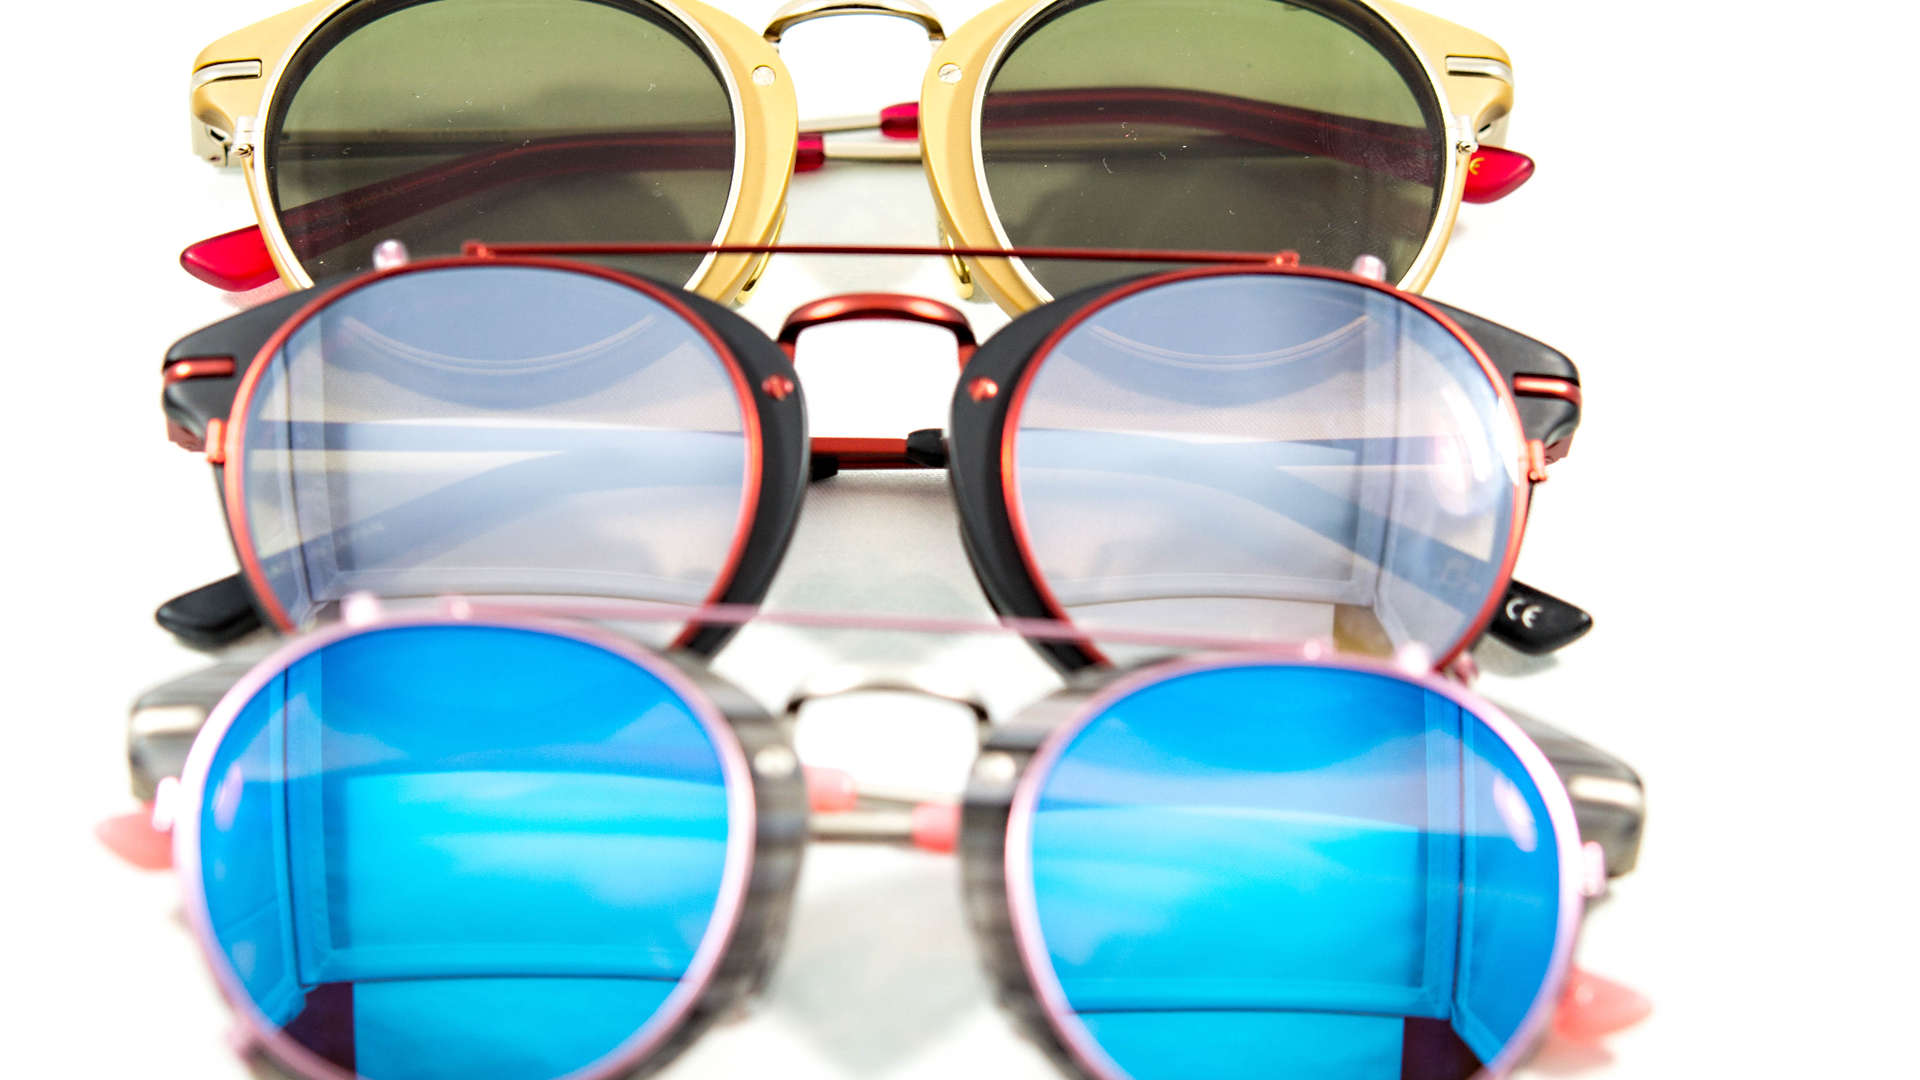 RVS Eyewear - style: Ella.jpg